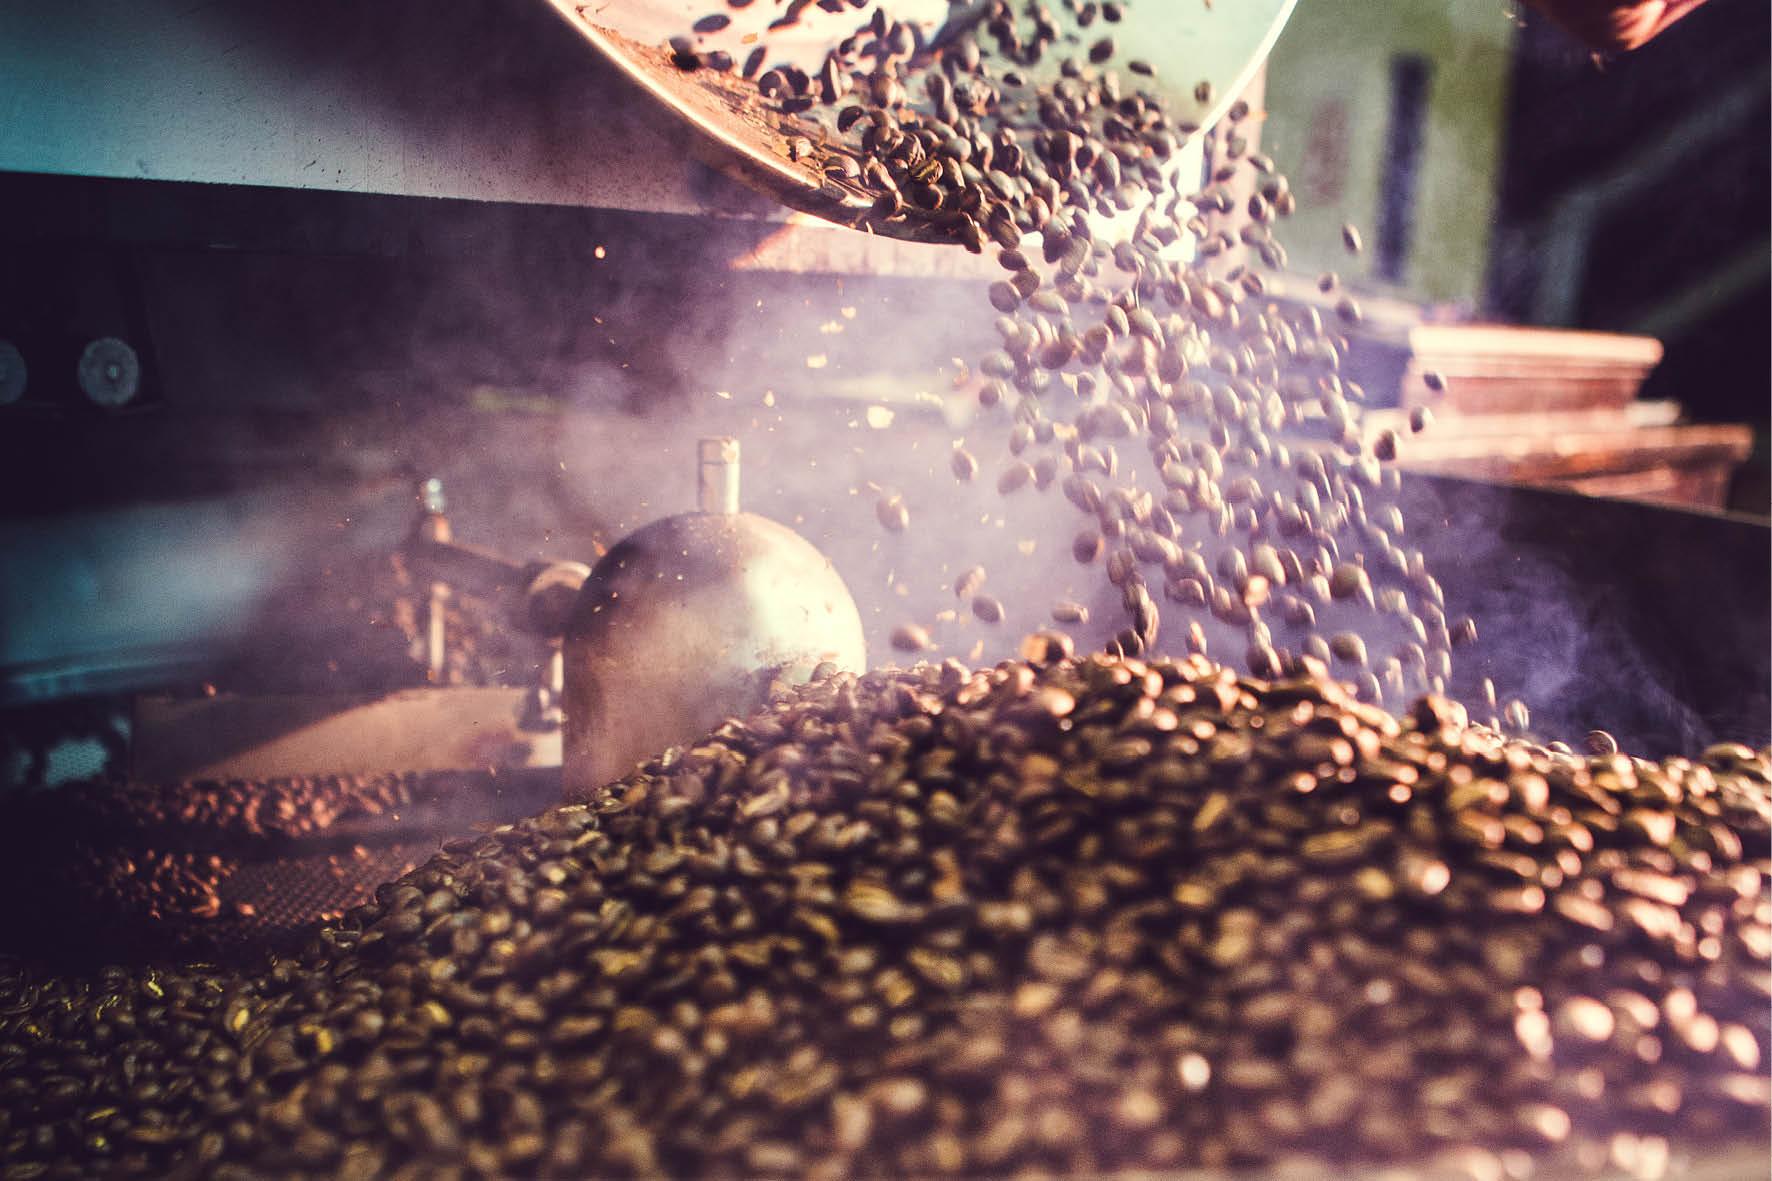 darwoods_coffee_7.jpg